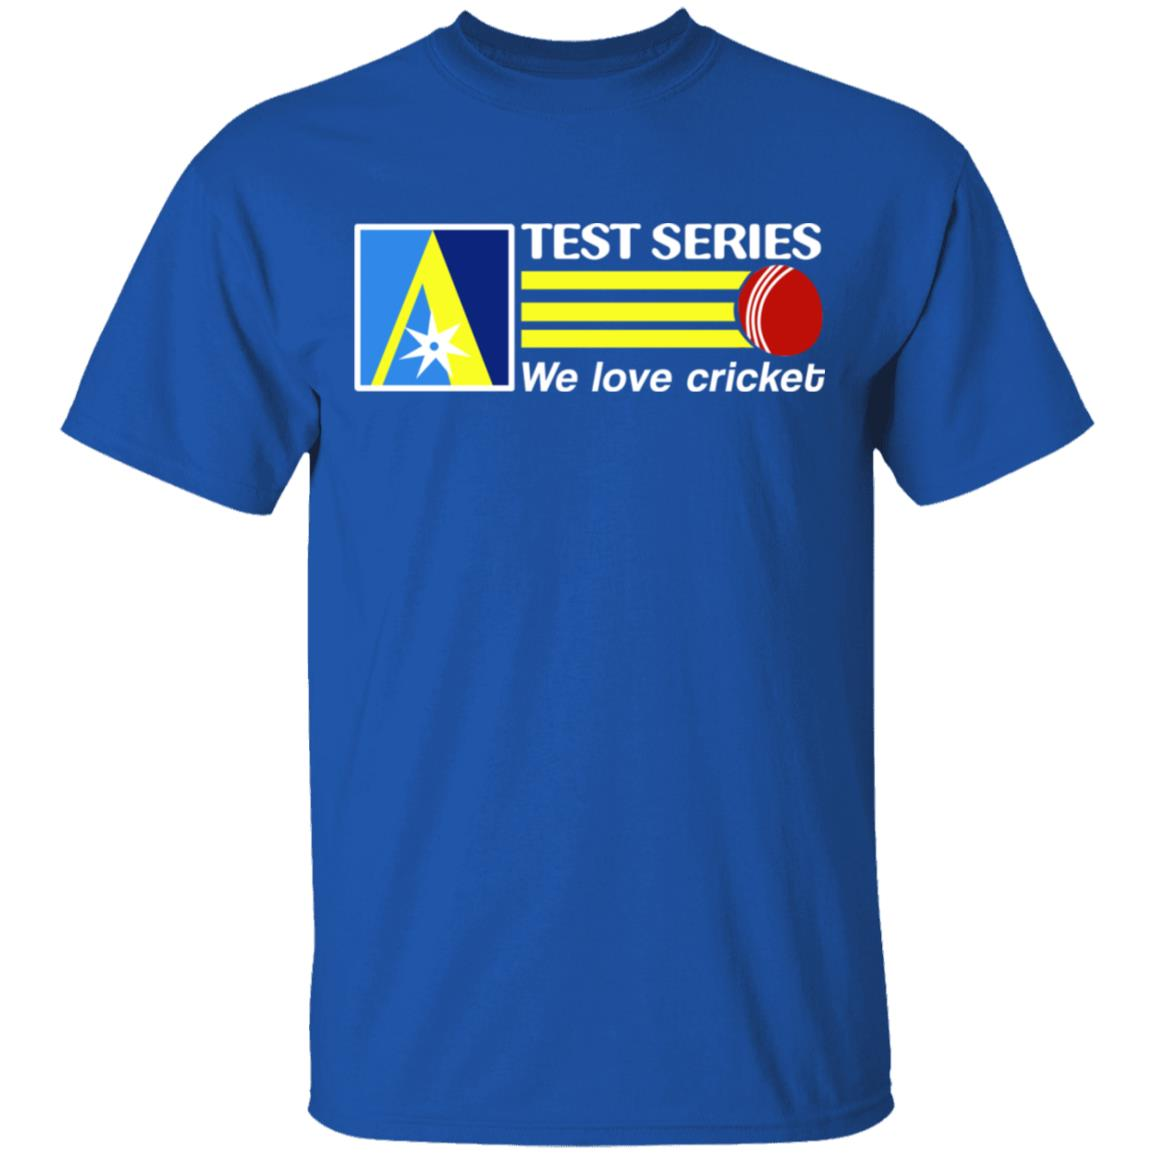 test series we love cricket tshirts  el real texmex